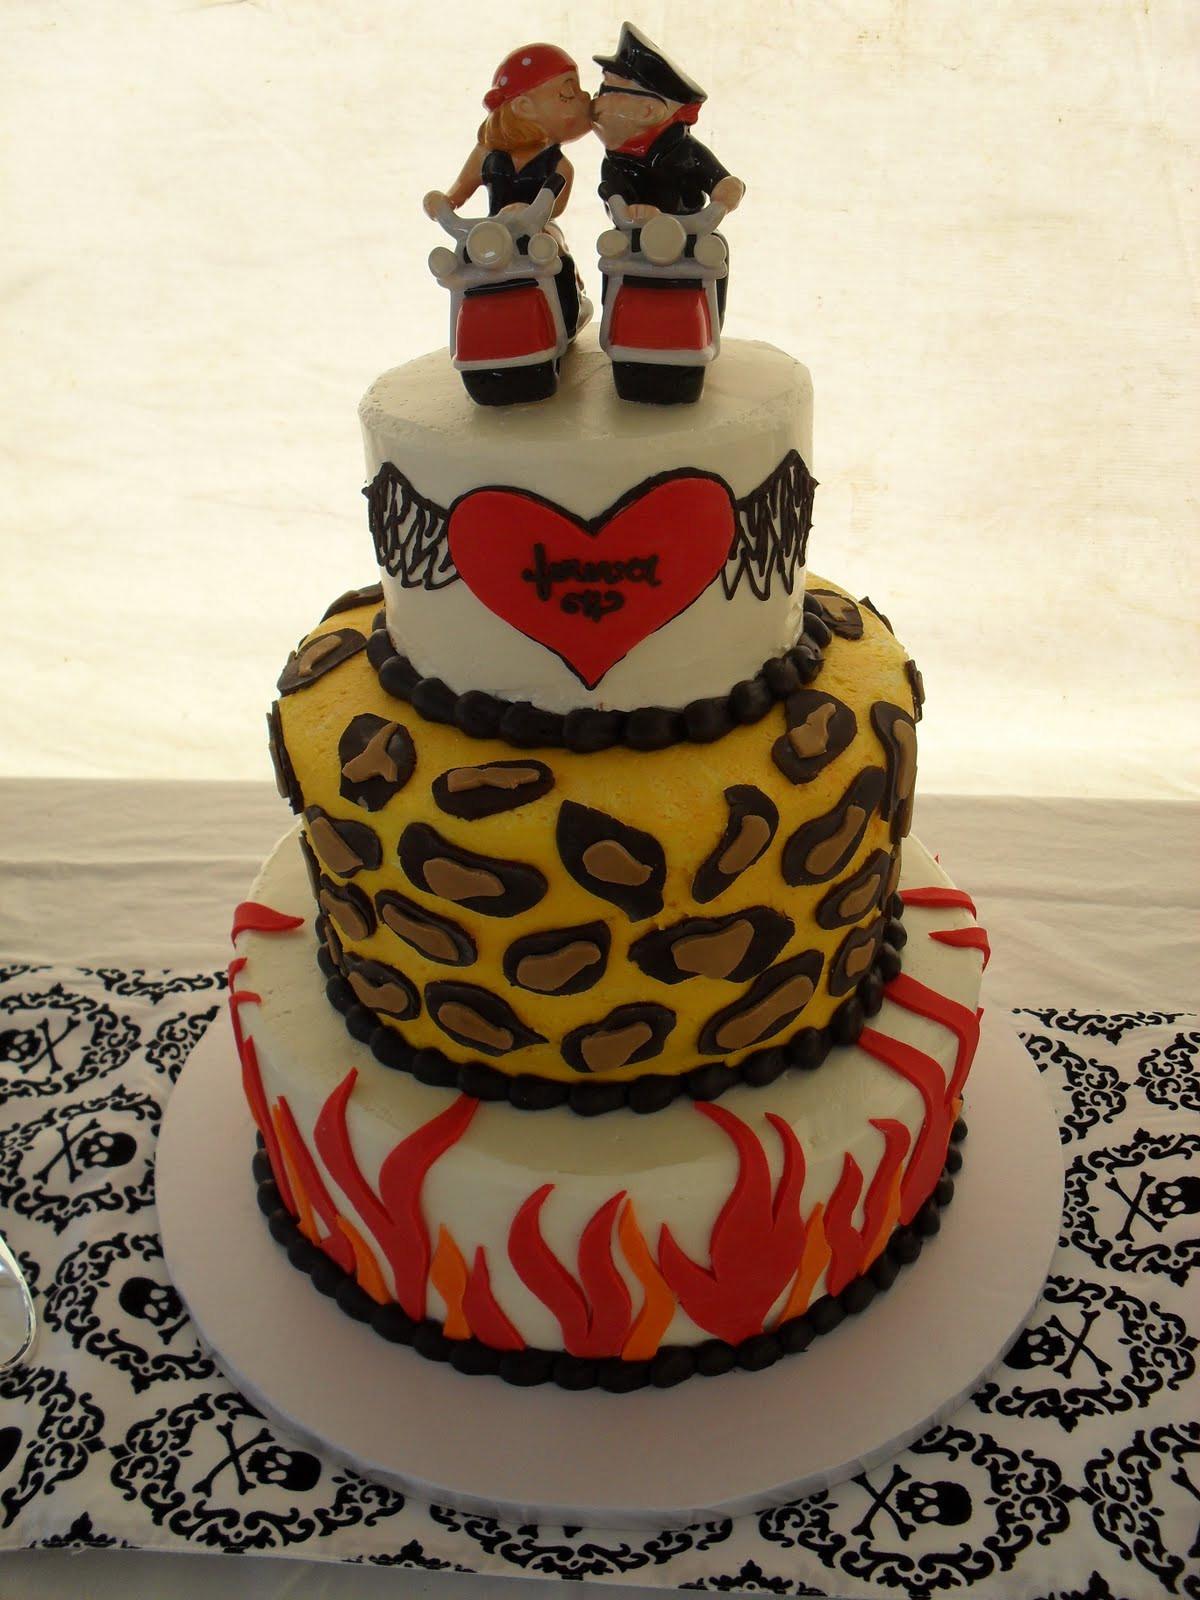 Biker Wedding Cakes  Brandi s Sweets Biker Themed Wedding Cake